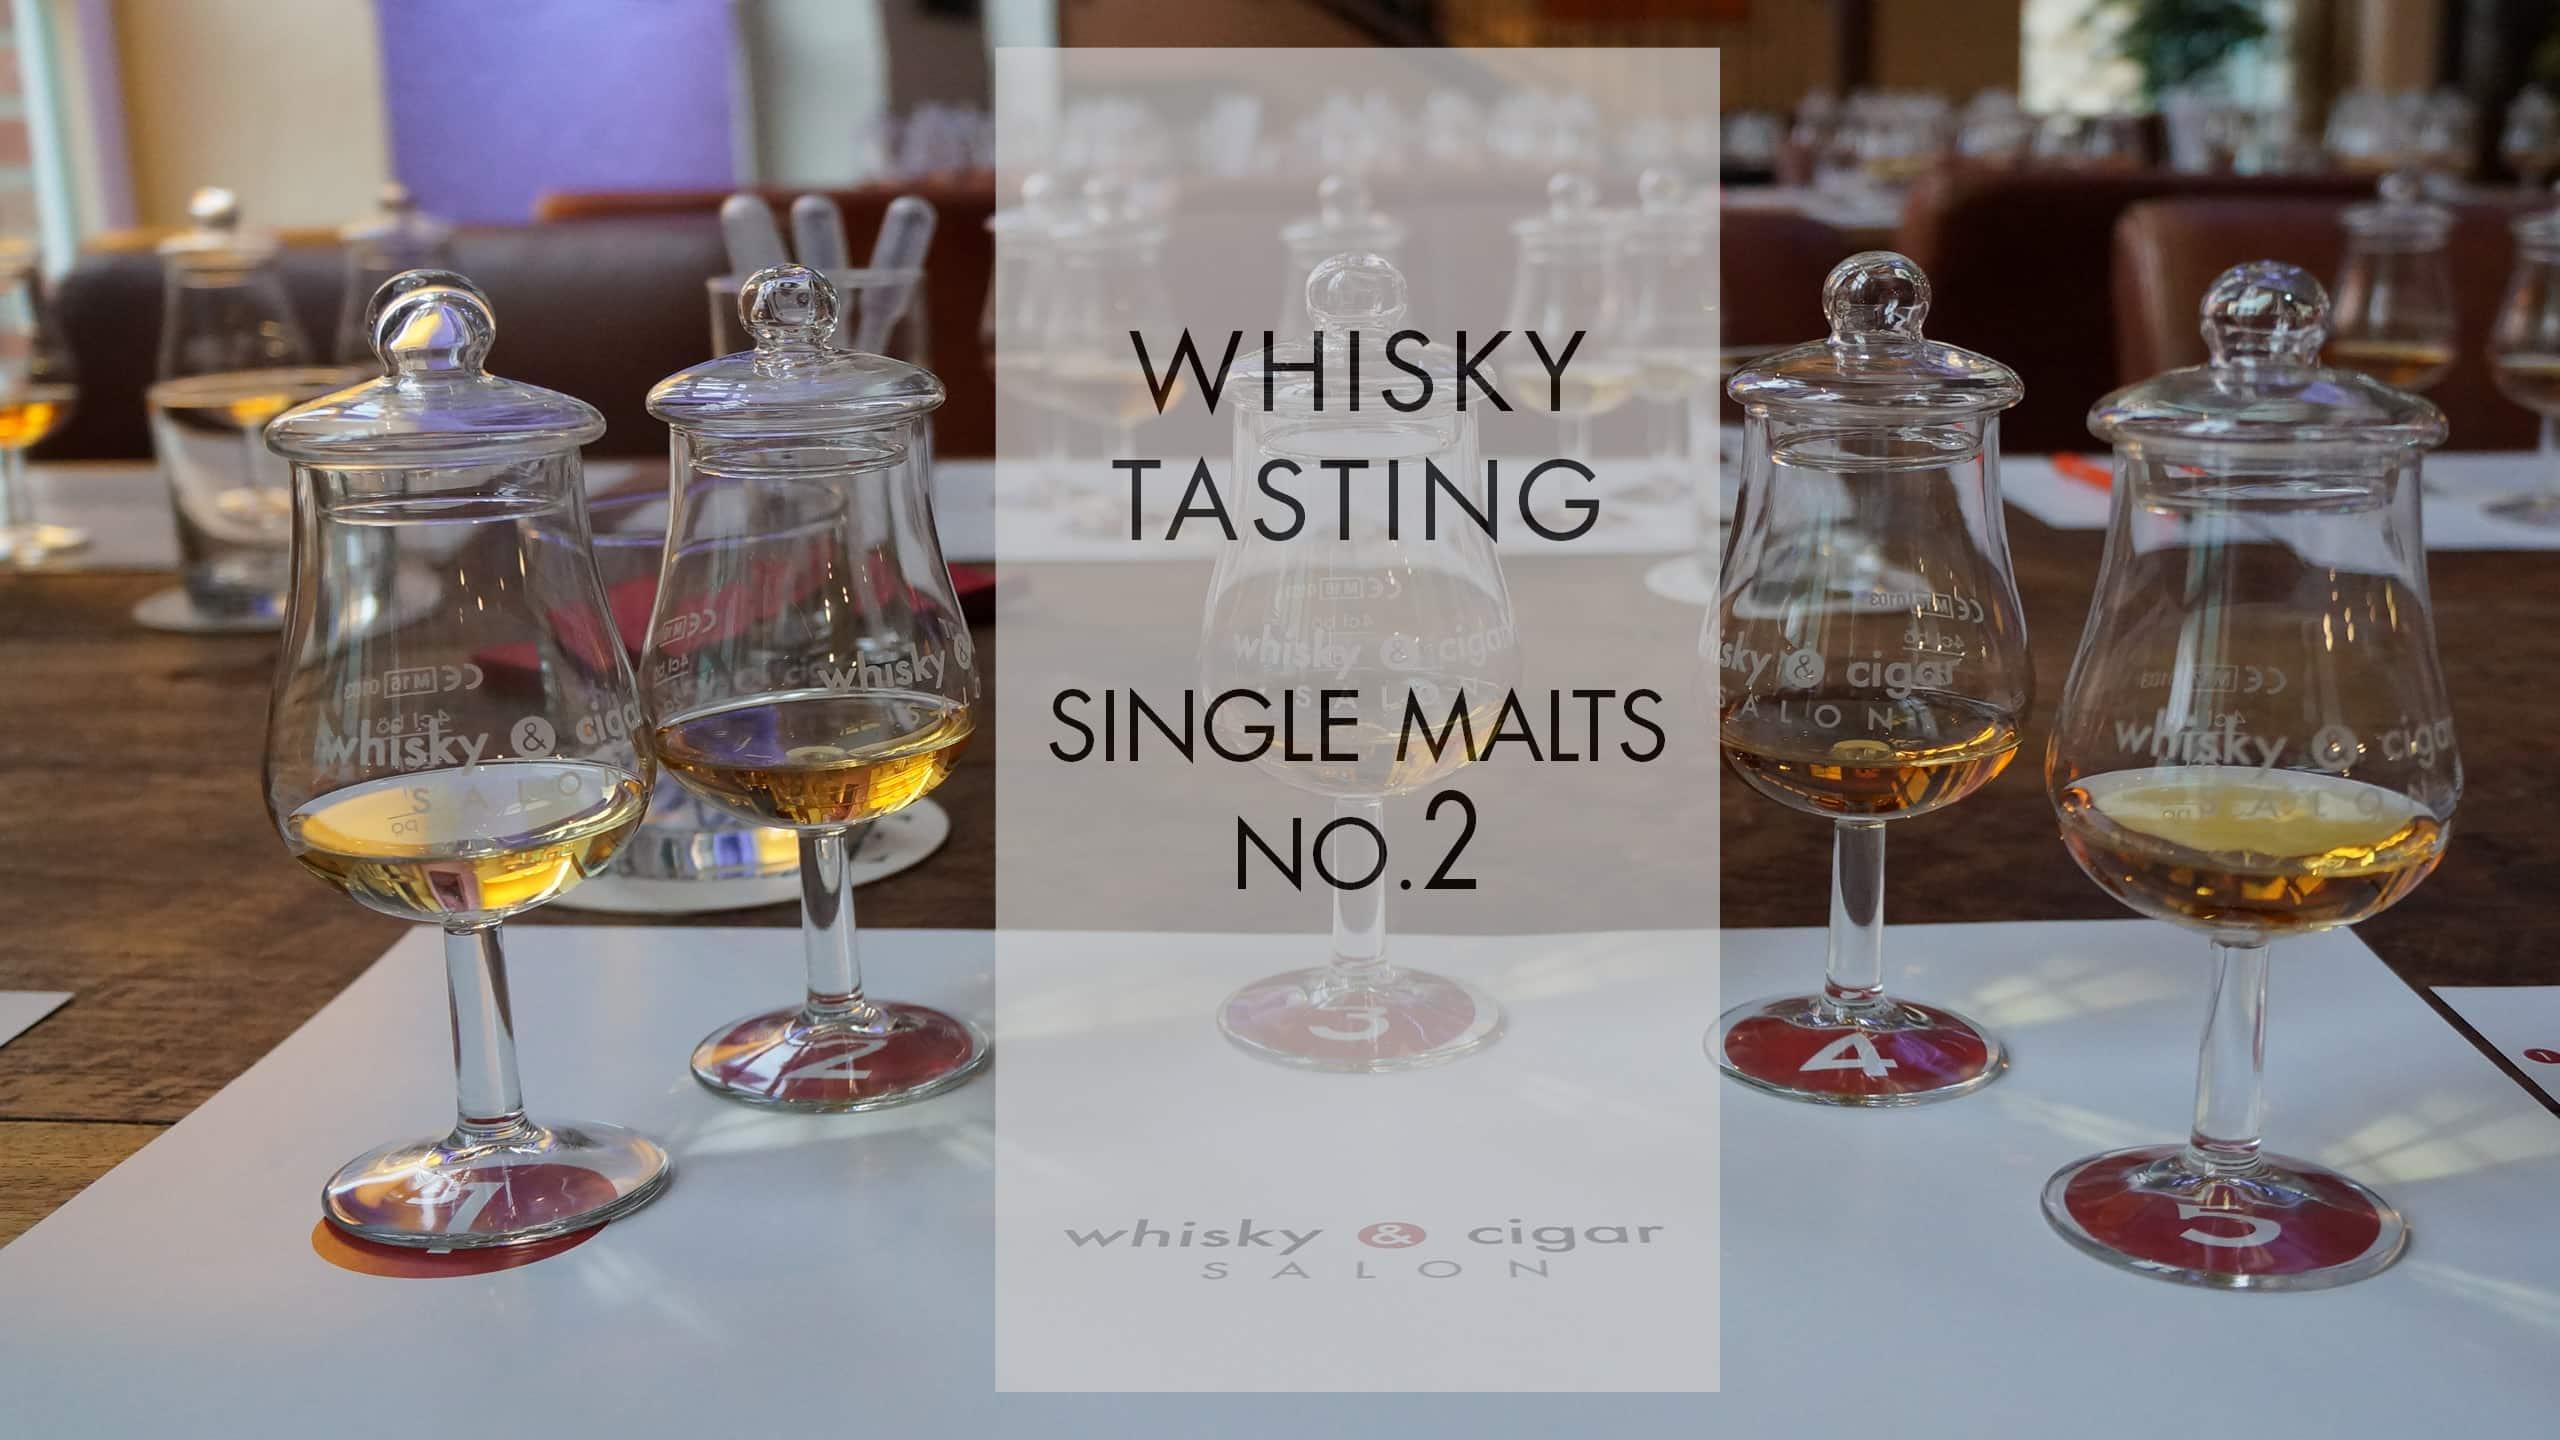 Single Malt Whisky Tasting im whisky & cigar salon